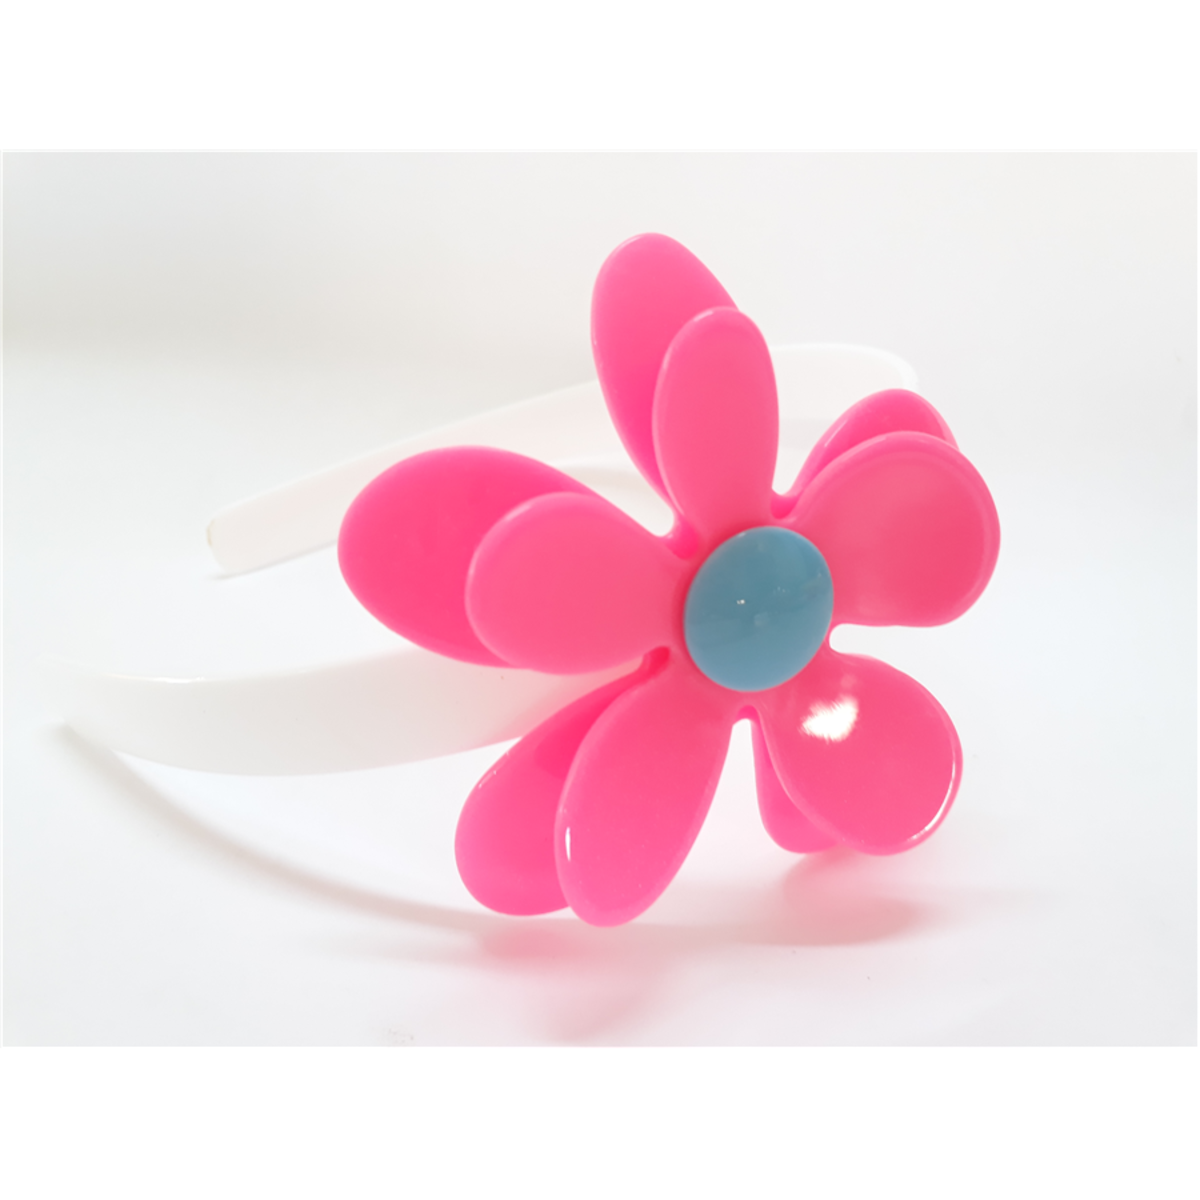 Tiara De Acrílico Flor Rosa Neon Com Miolo Azul No Elo7 Malu